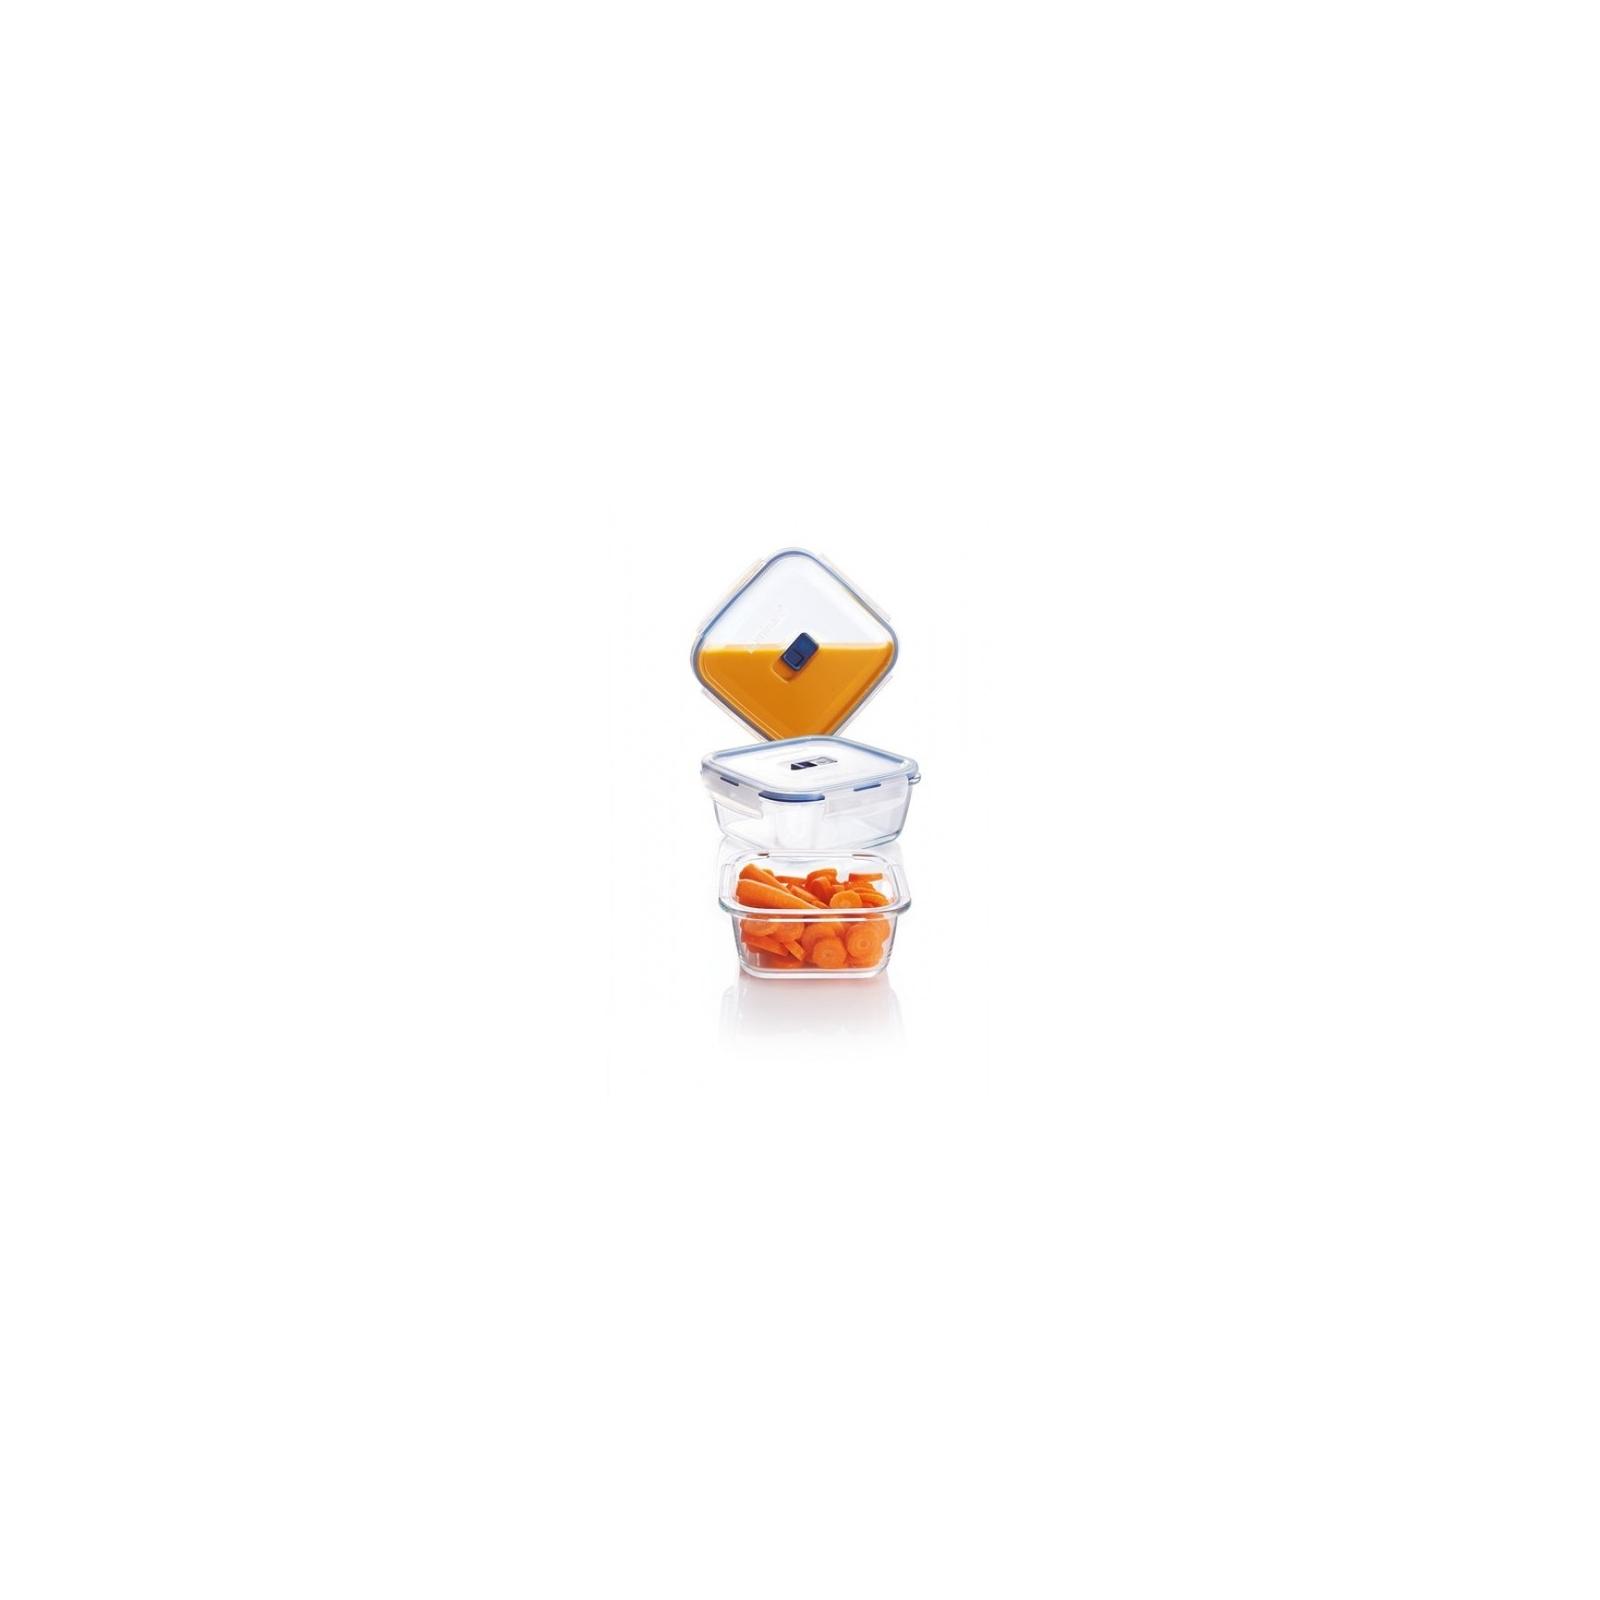 Пищевой контейнер Luminarc Pure Box Active набор 3шт квадр. 380мл/770мл/1220мл (P5276)